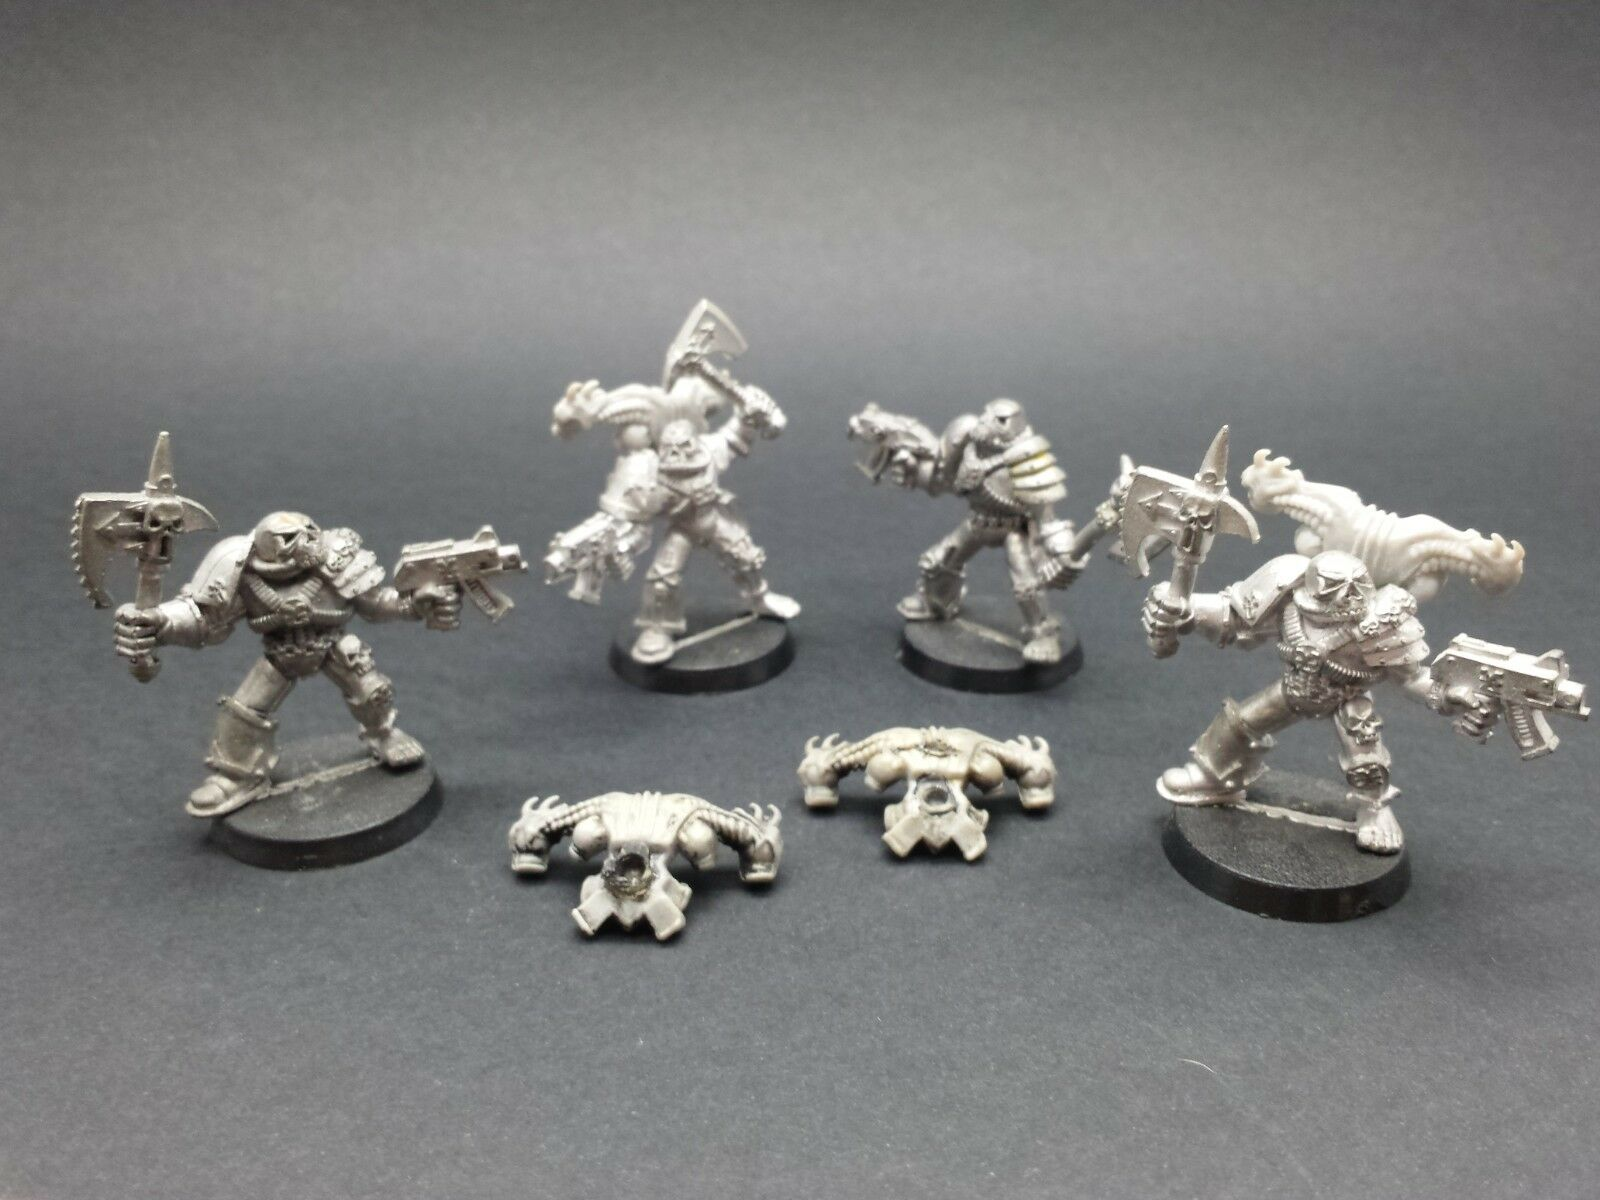 Warhammer 40k Vintage Chaos spazio Marines WorldEaters METAL  miniatures OOP RARE  Sconto del 70%